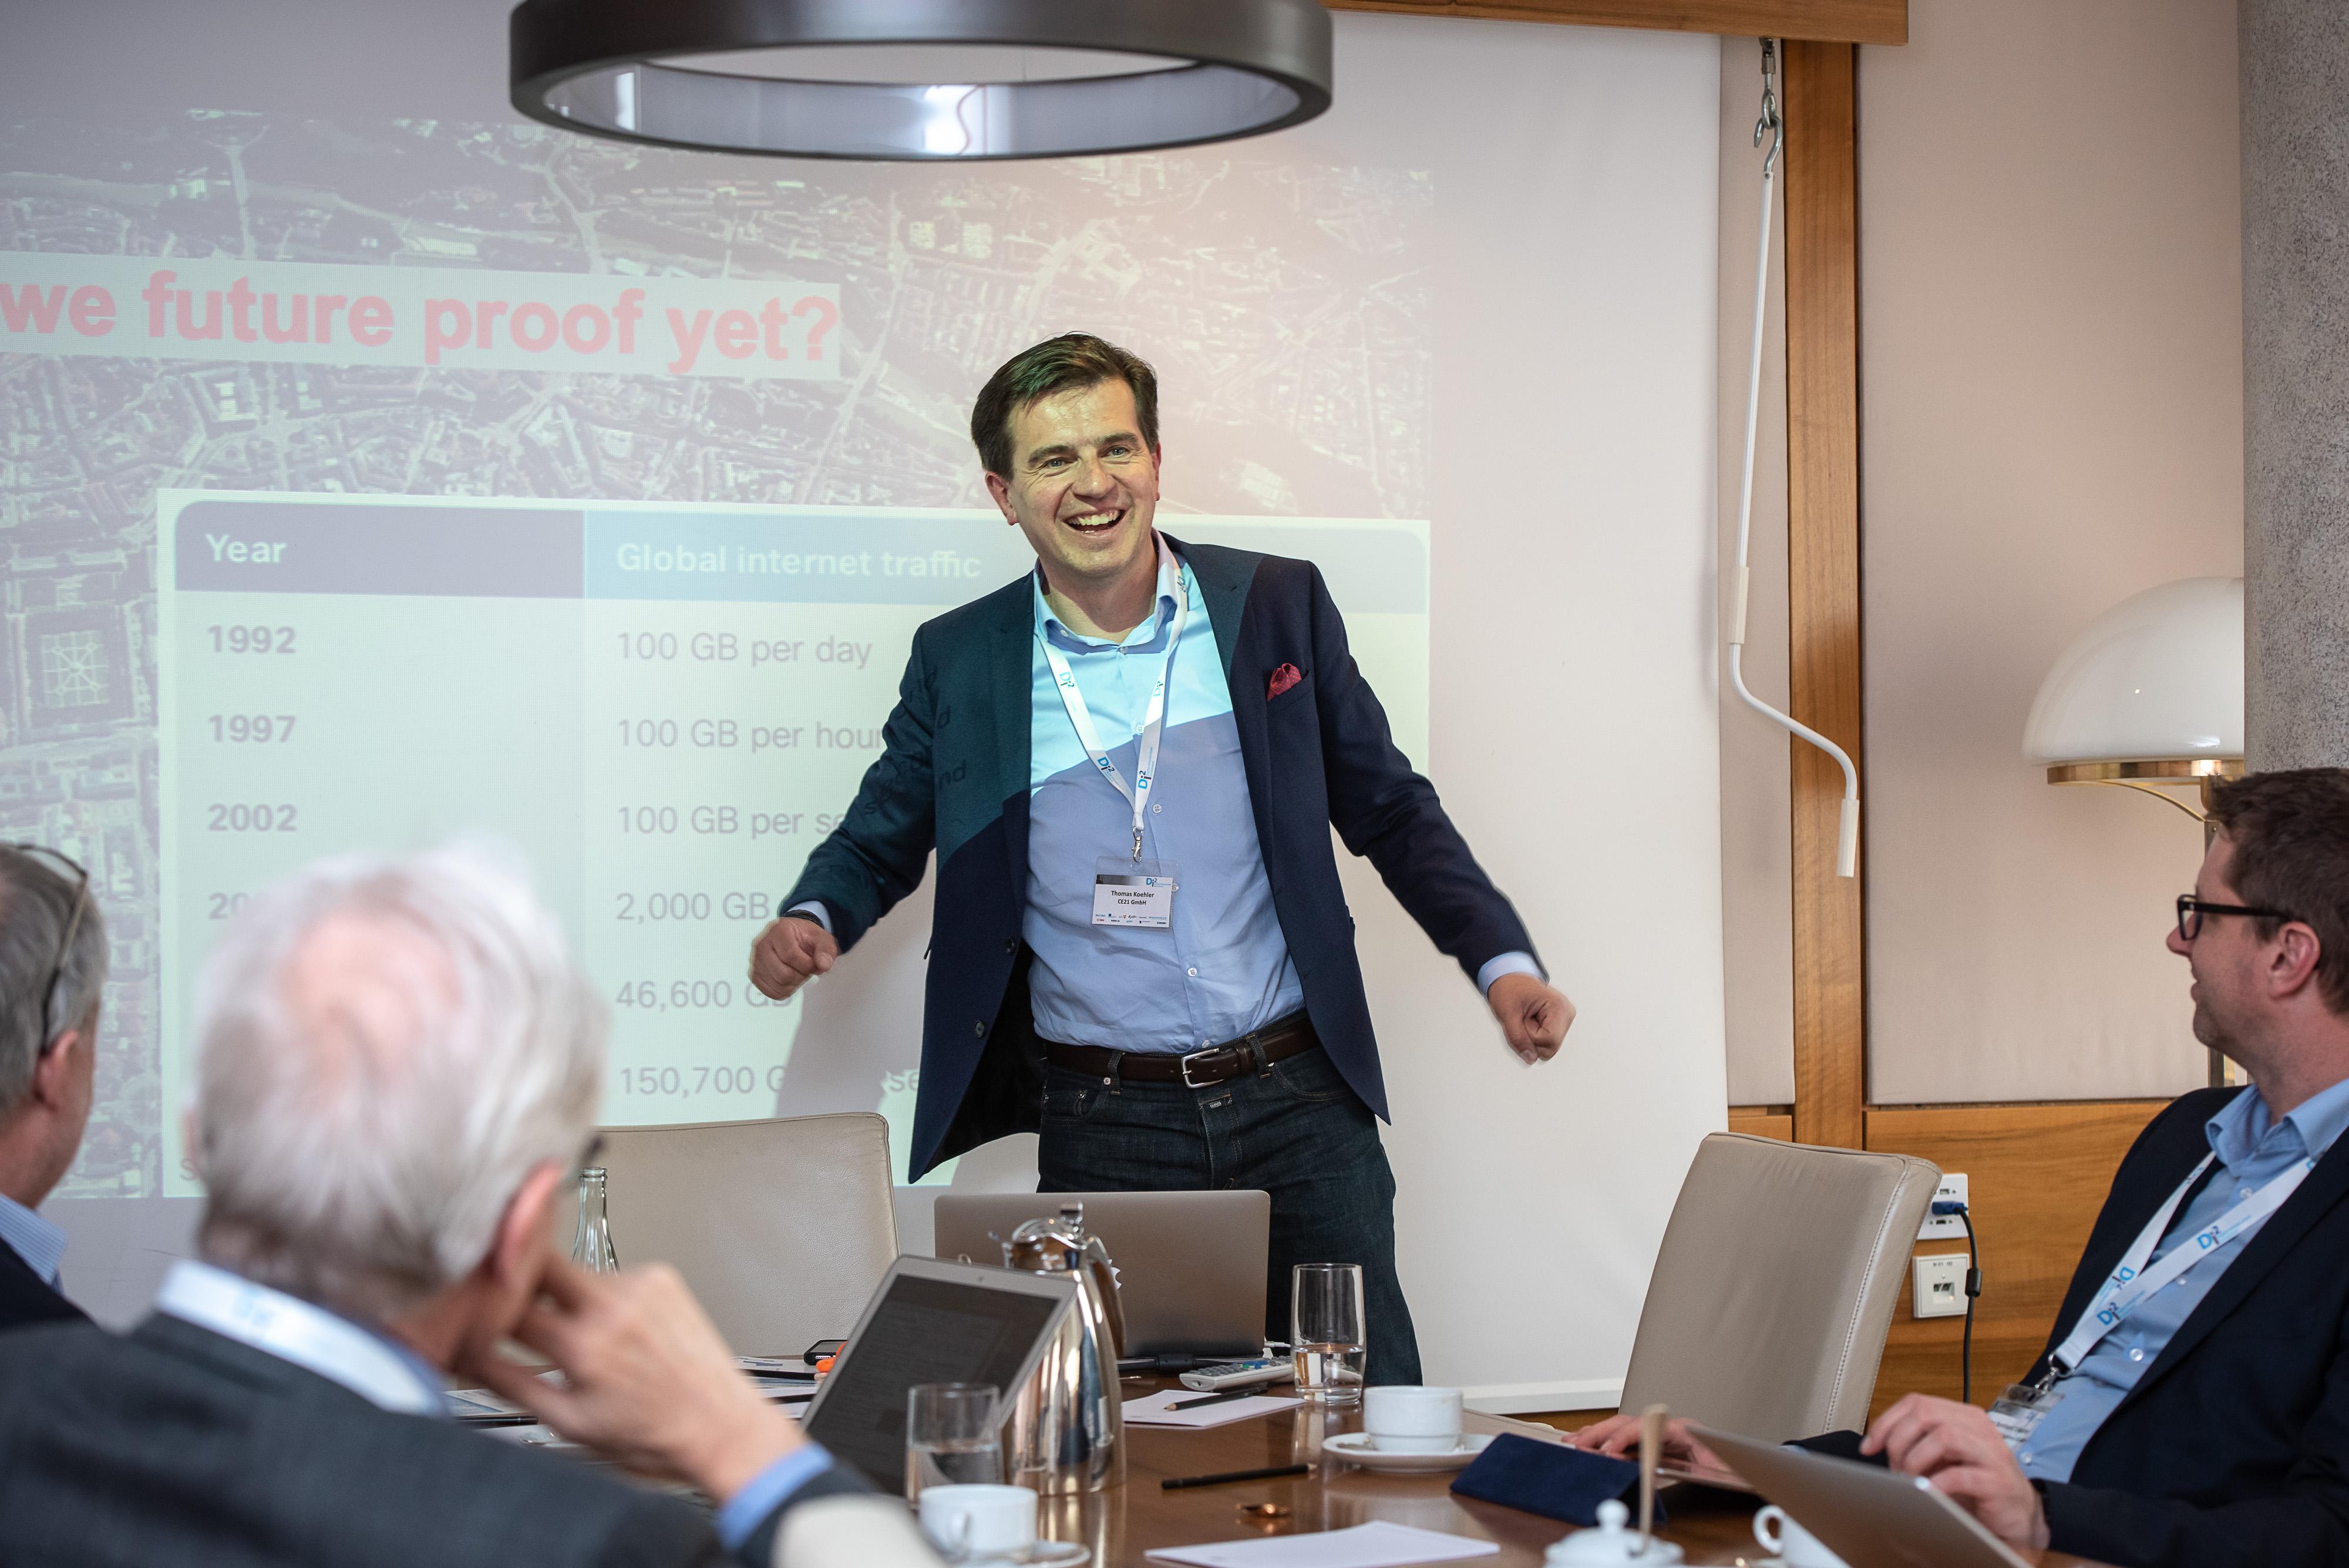 Expert Marketplace - Prof. Thomas R. Köhler - Impressionen eins